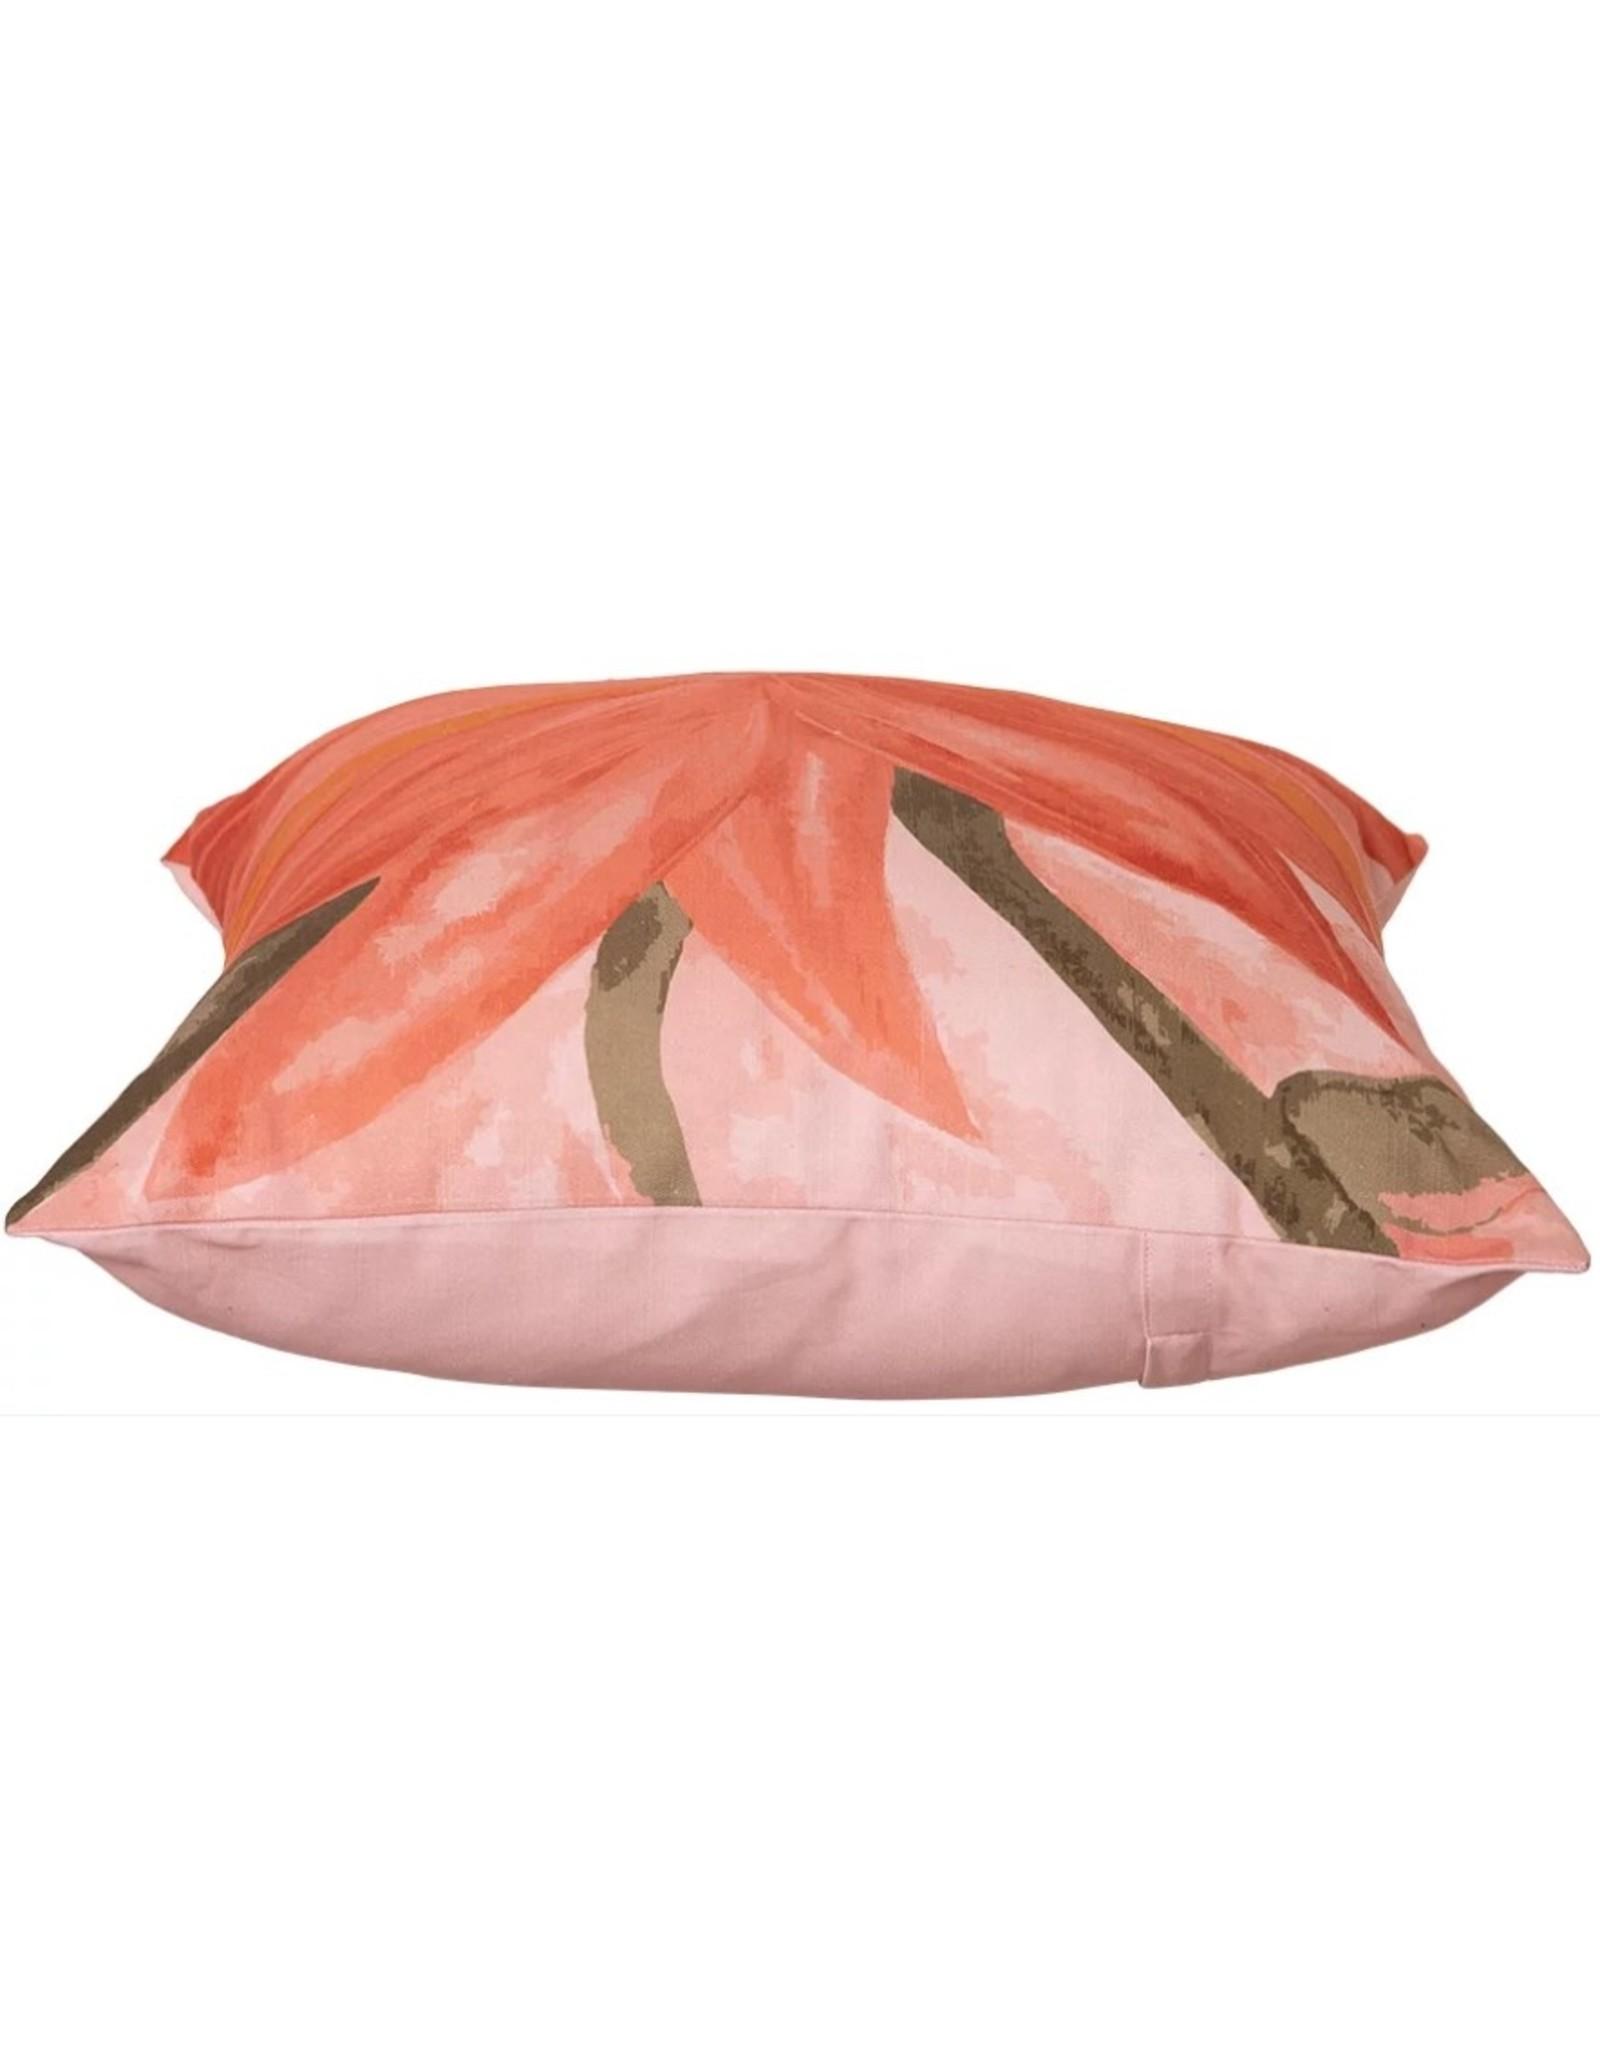 Zahara Cushion 50x50cm Multi Colored